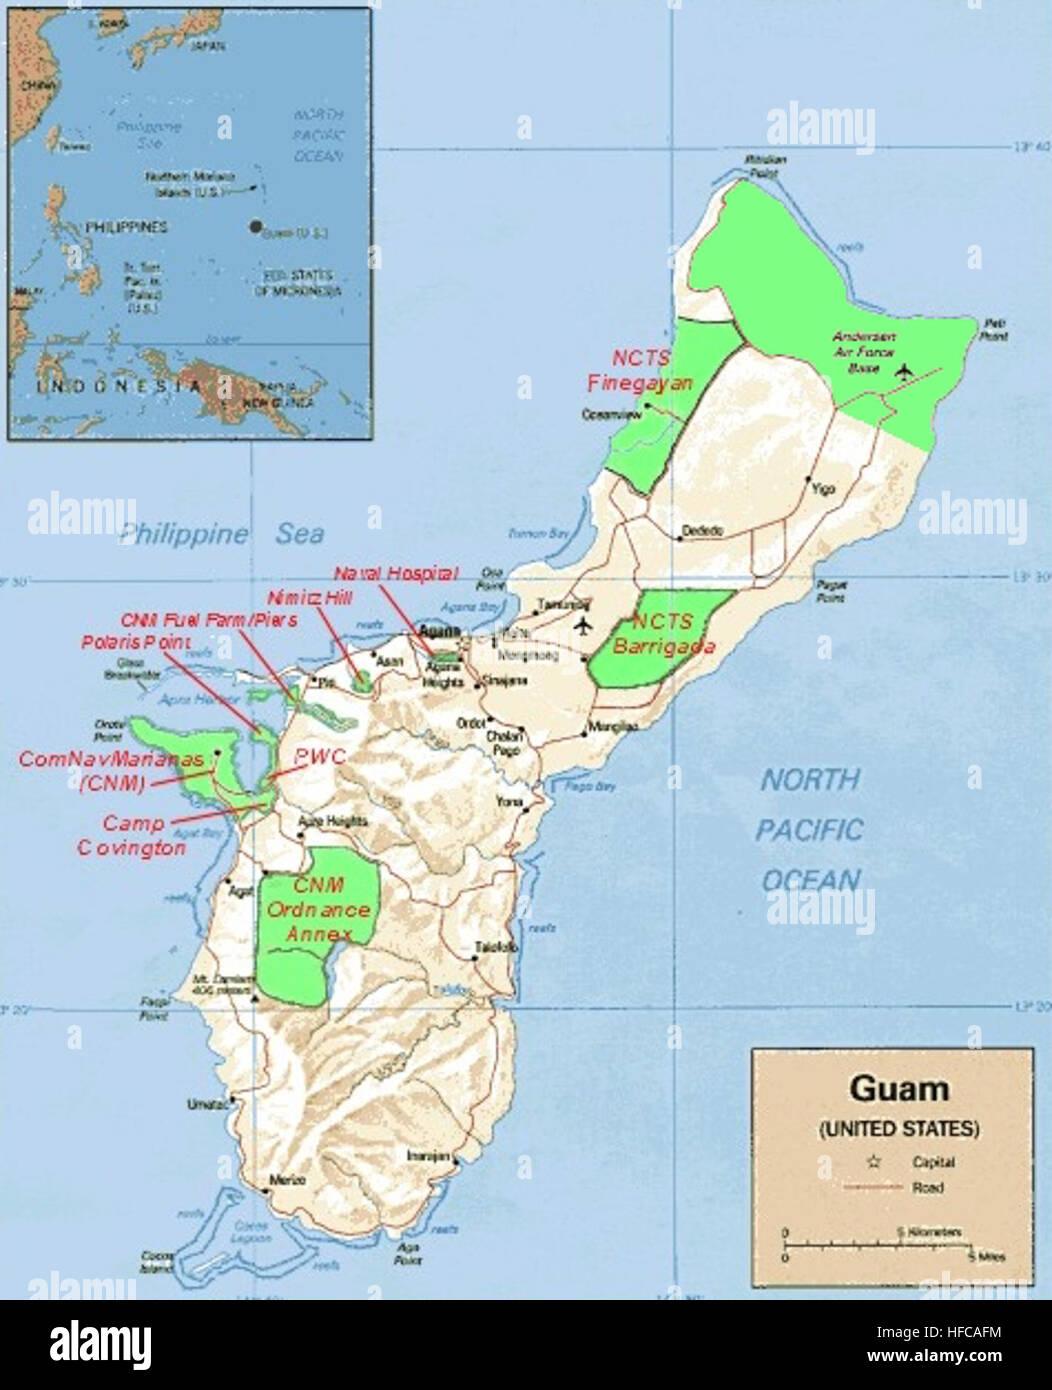 Guam Map Stock Photos & Guam Map Stock Images - Alamy Guam In Us Map on jordan in map, djibouti in map, senegal in map, idaho in map, pearl harbor in map, saudi arabia in map, mauritania in map, grenada in map, south sudan in map, andorra in map, luxembourg in map, uzbekistan in map, togo in map, bahrain in map, turkmenistan in map, prague in map, saint lucia in map, brisbane in map, tennessee in map, brunei in map,